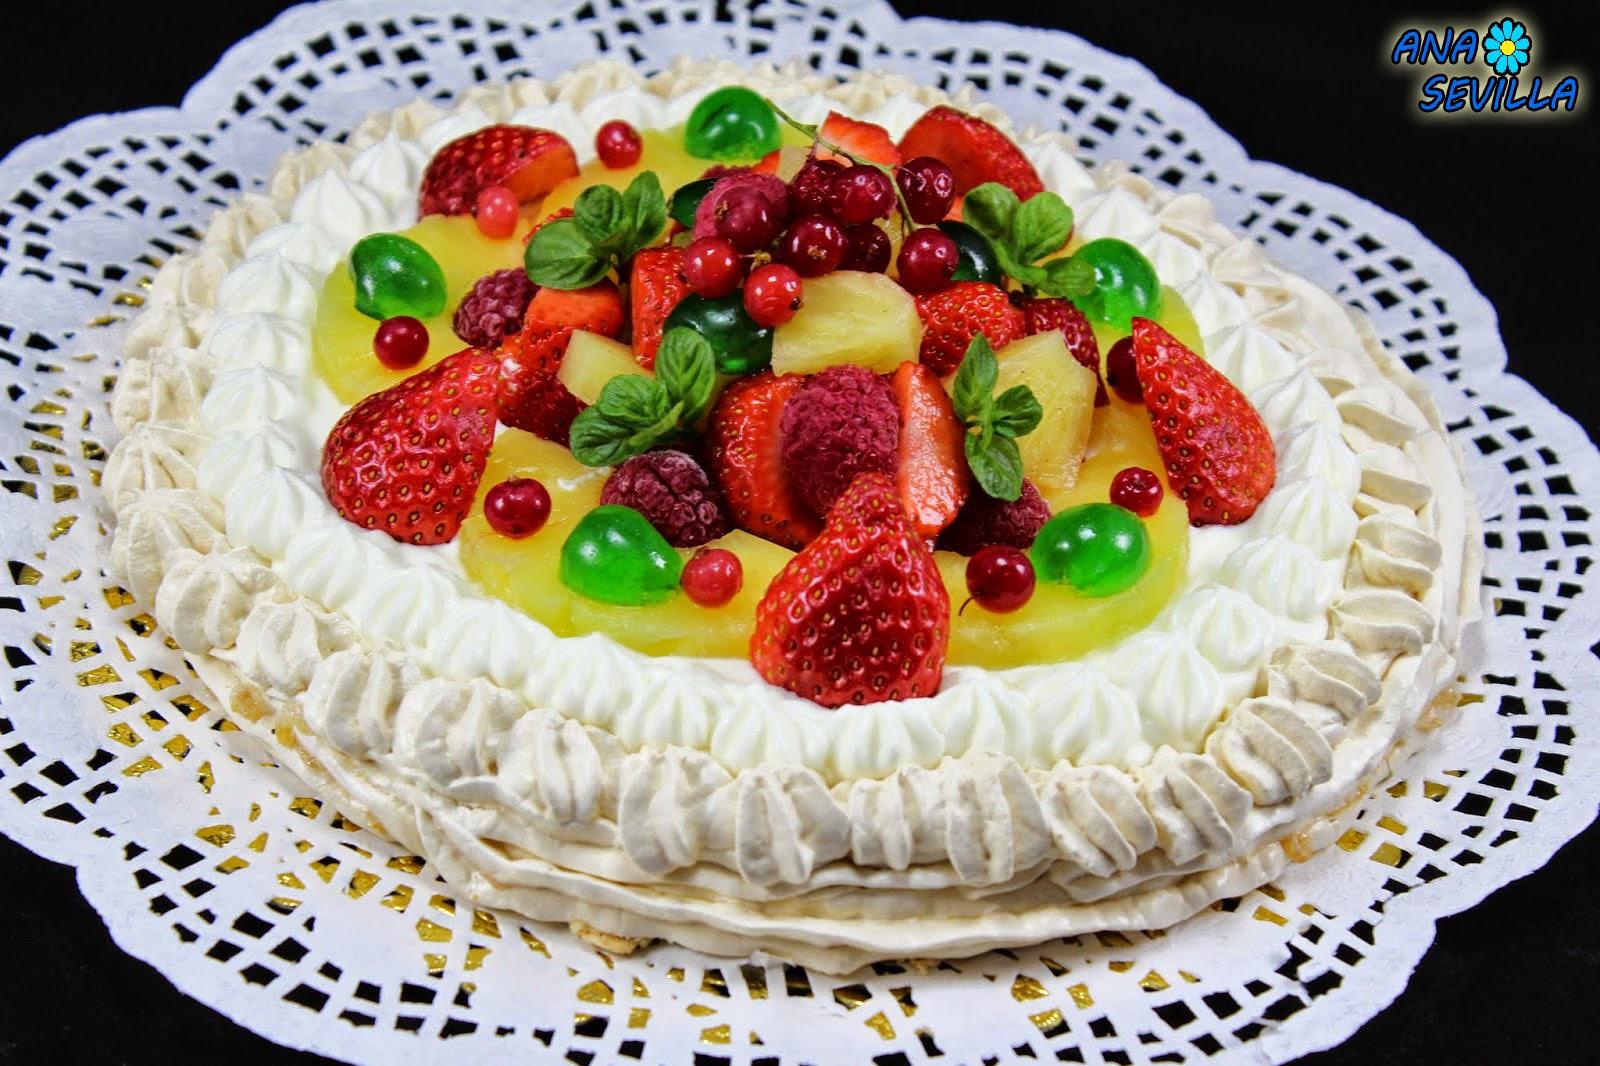 Tarta Pavlova de nata y frutas Ana Sevilla cocina tradicional